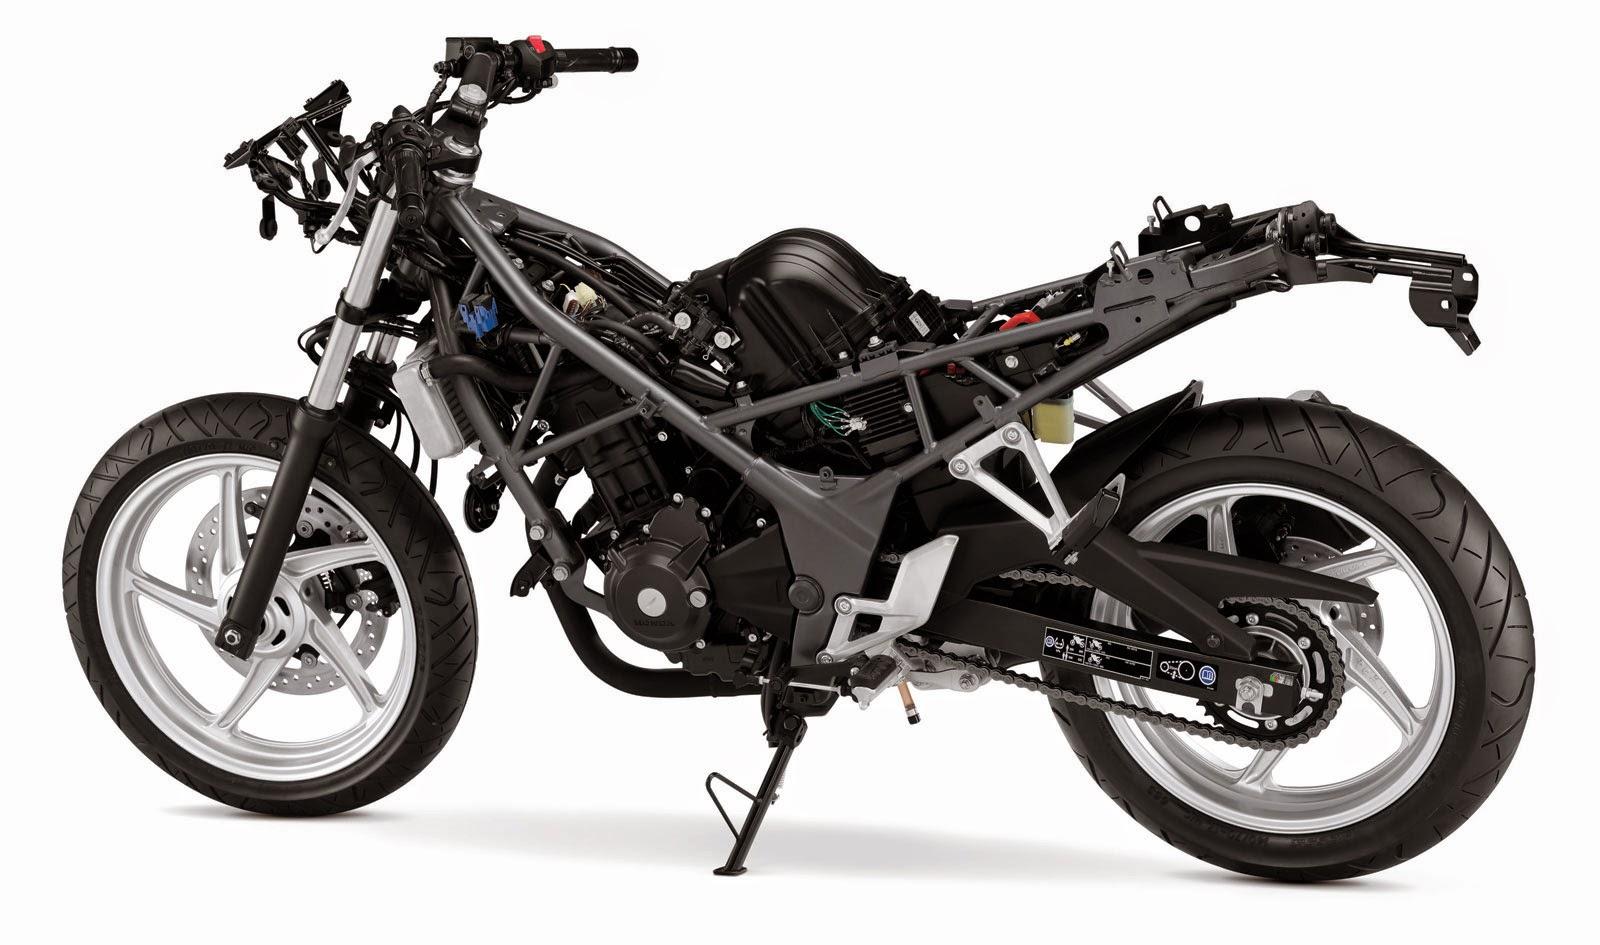 Download 84 Foto Modif Motor Honda Verza Terupdate Griya Modifikasi